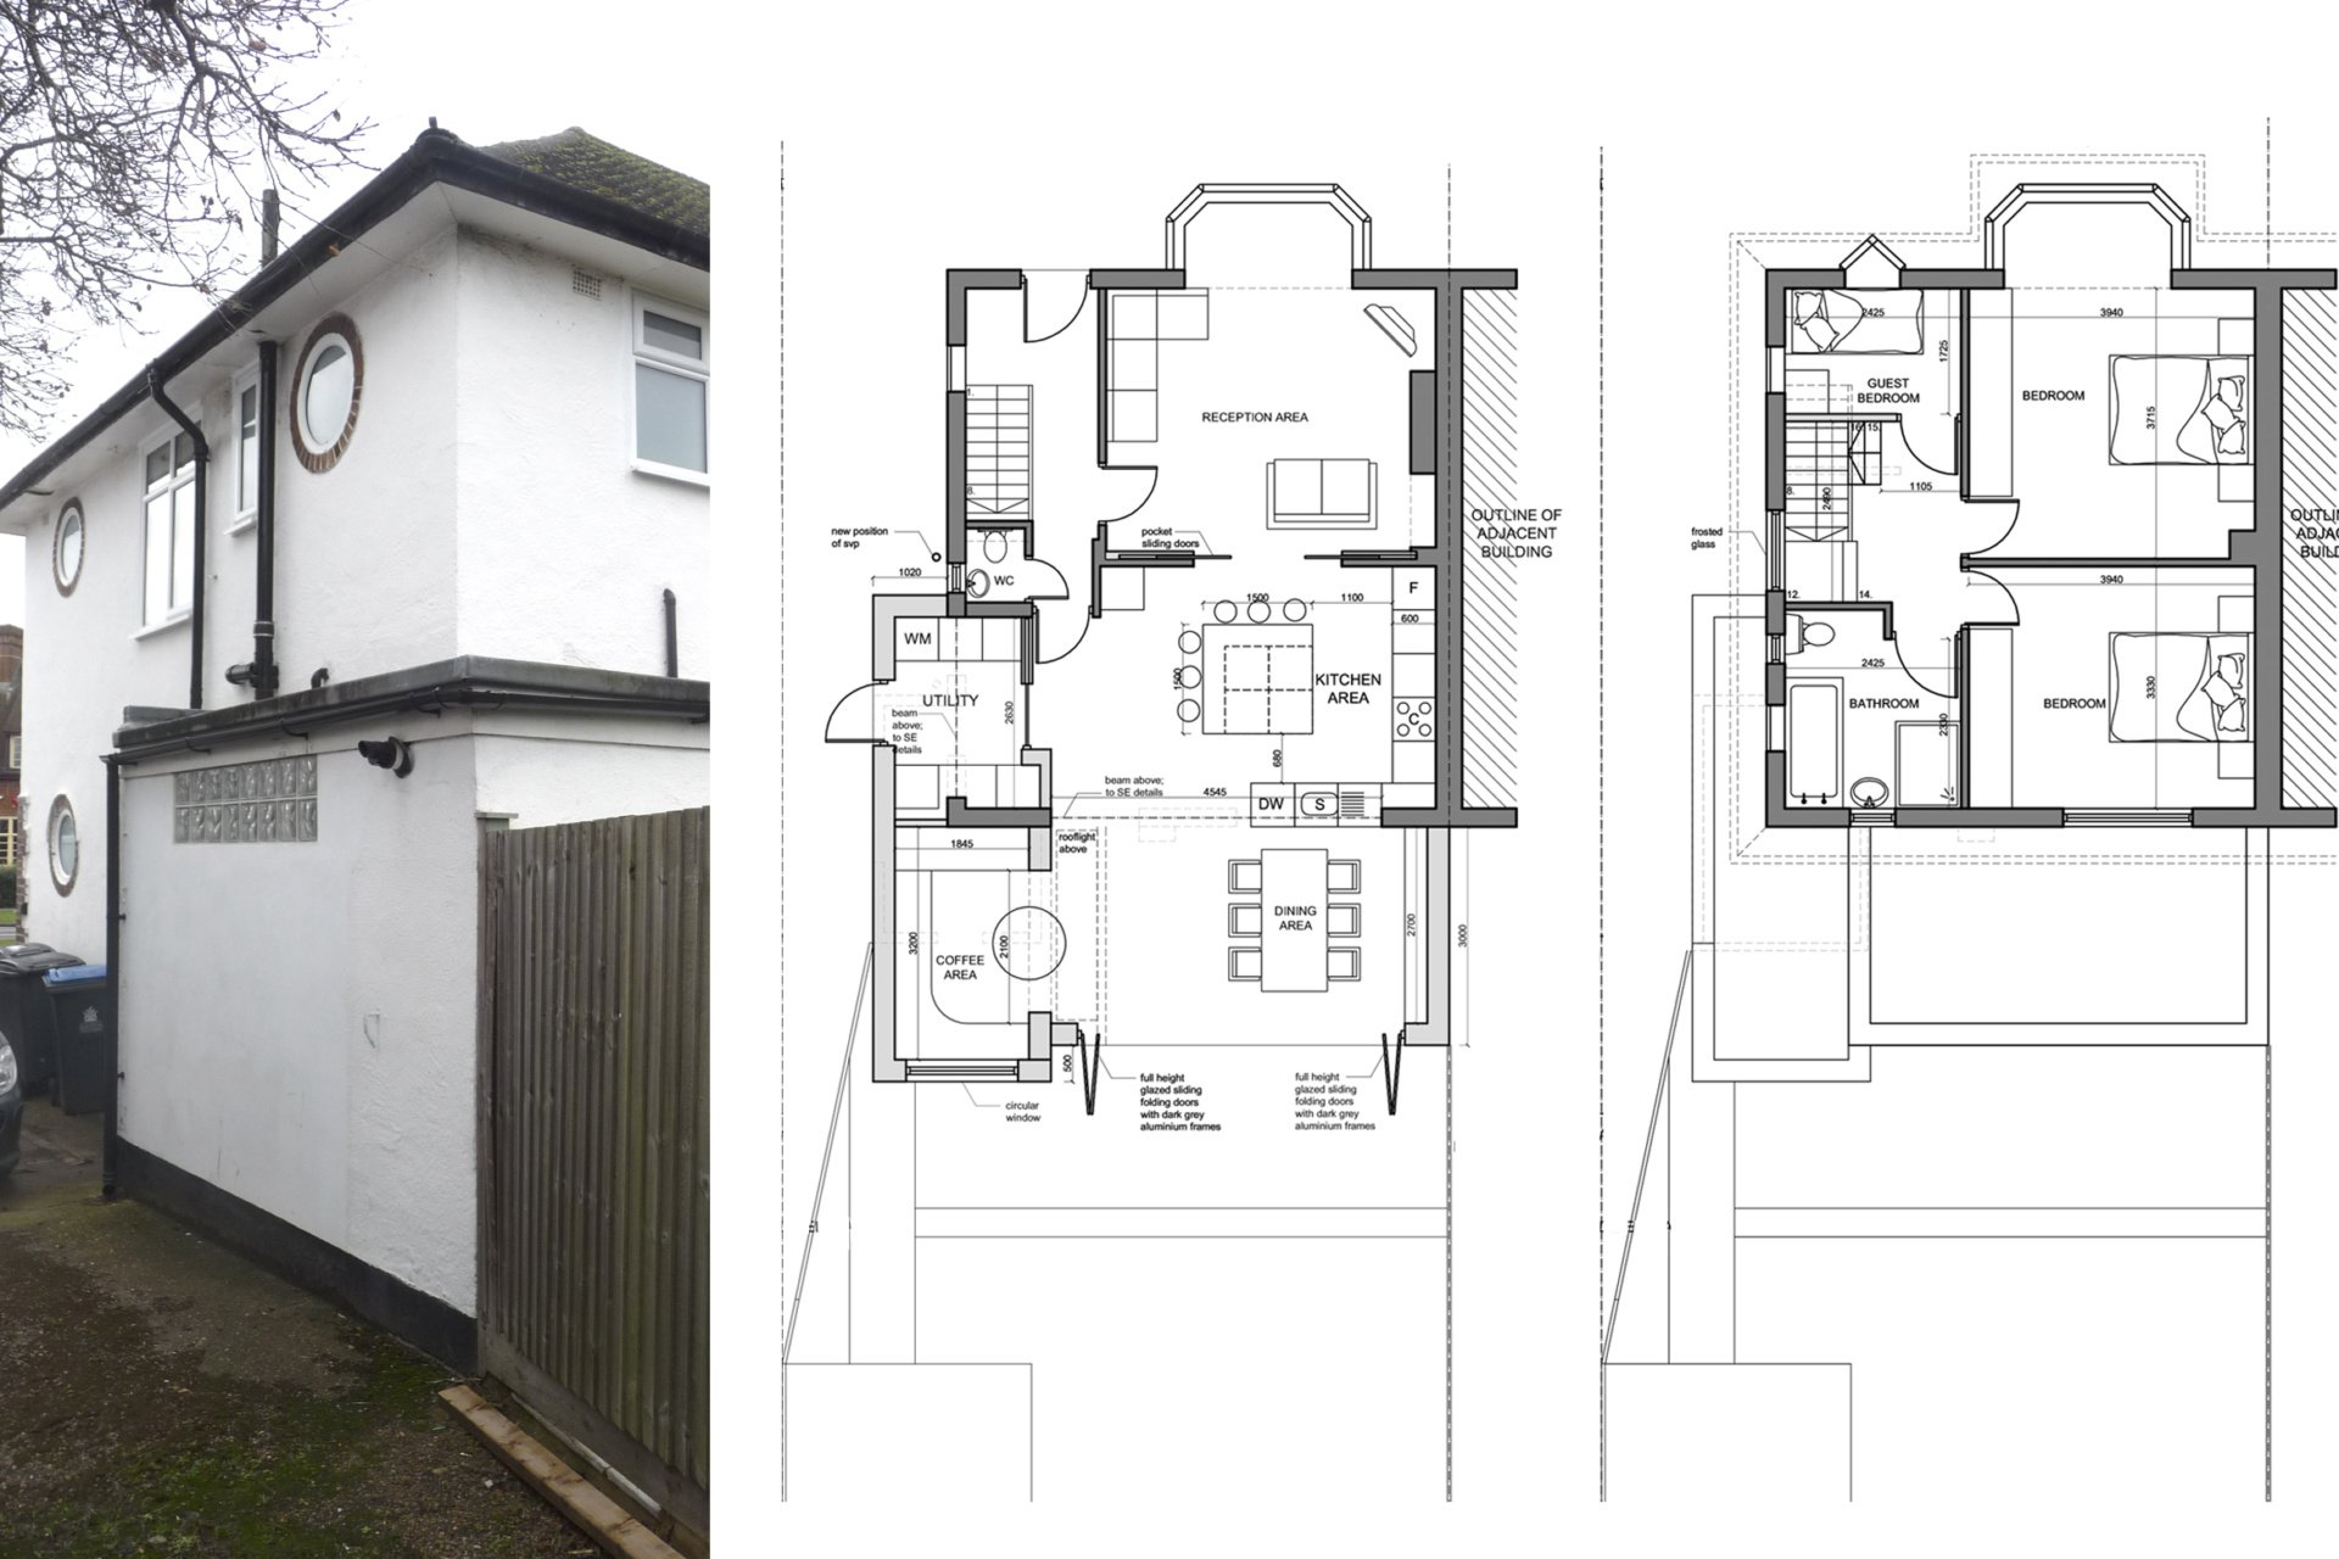 Architect designed roof and kitchen house extension Kingston KT2 Lower floor plans 1 Kingston KT2 | Roof and kitchen house extension